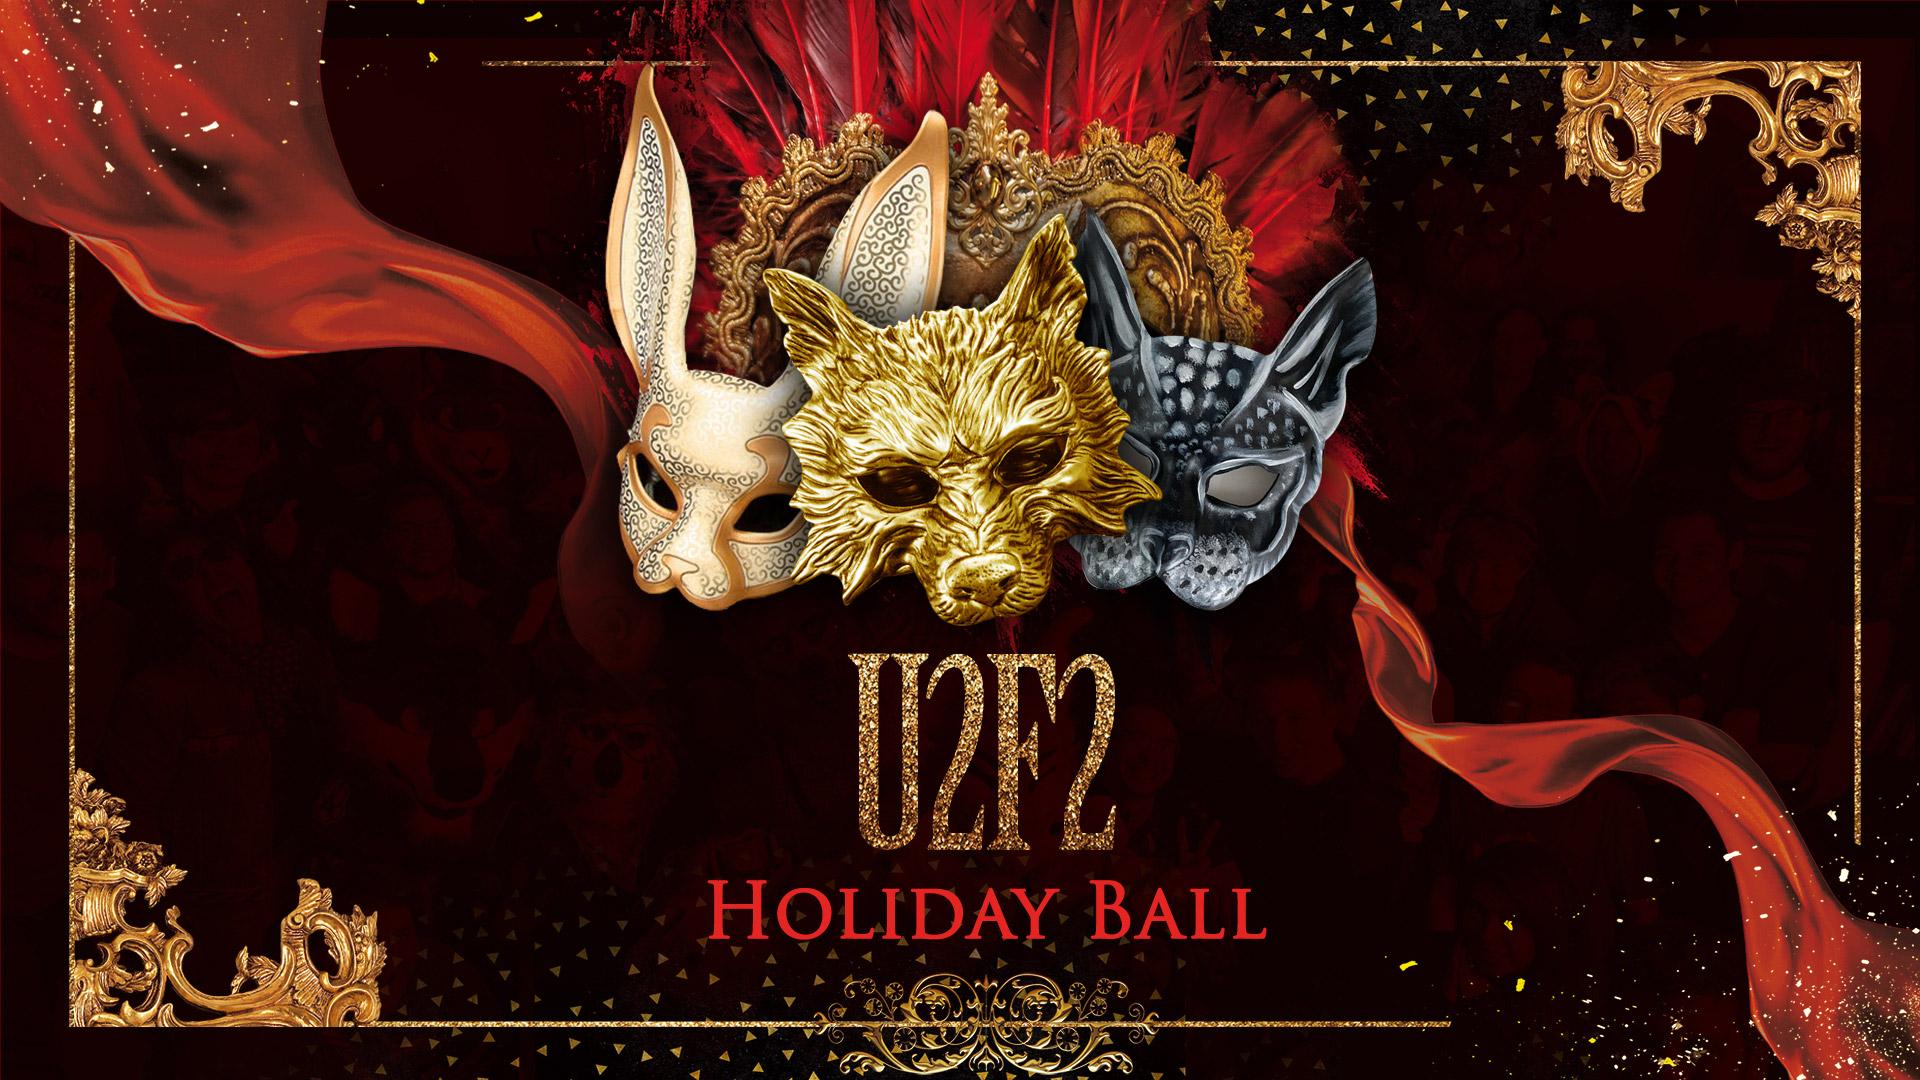 U2F2 Furry Holiday Ball Cover Image